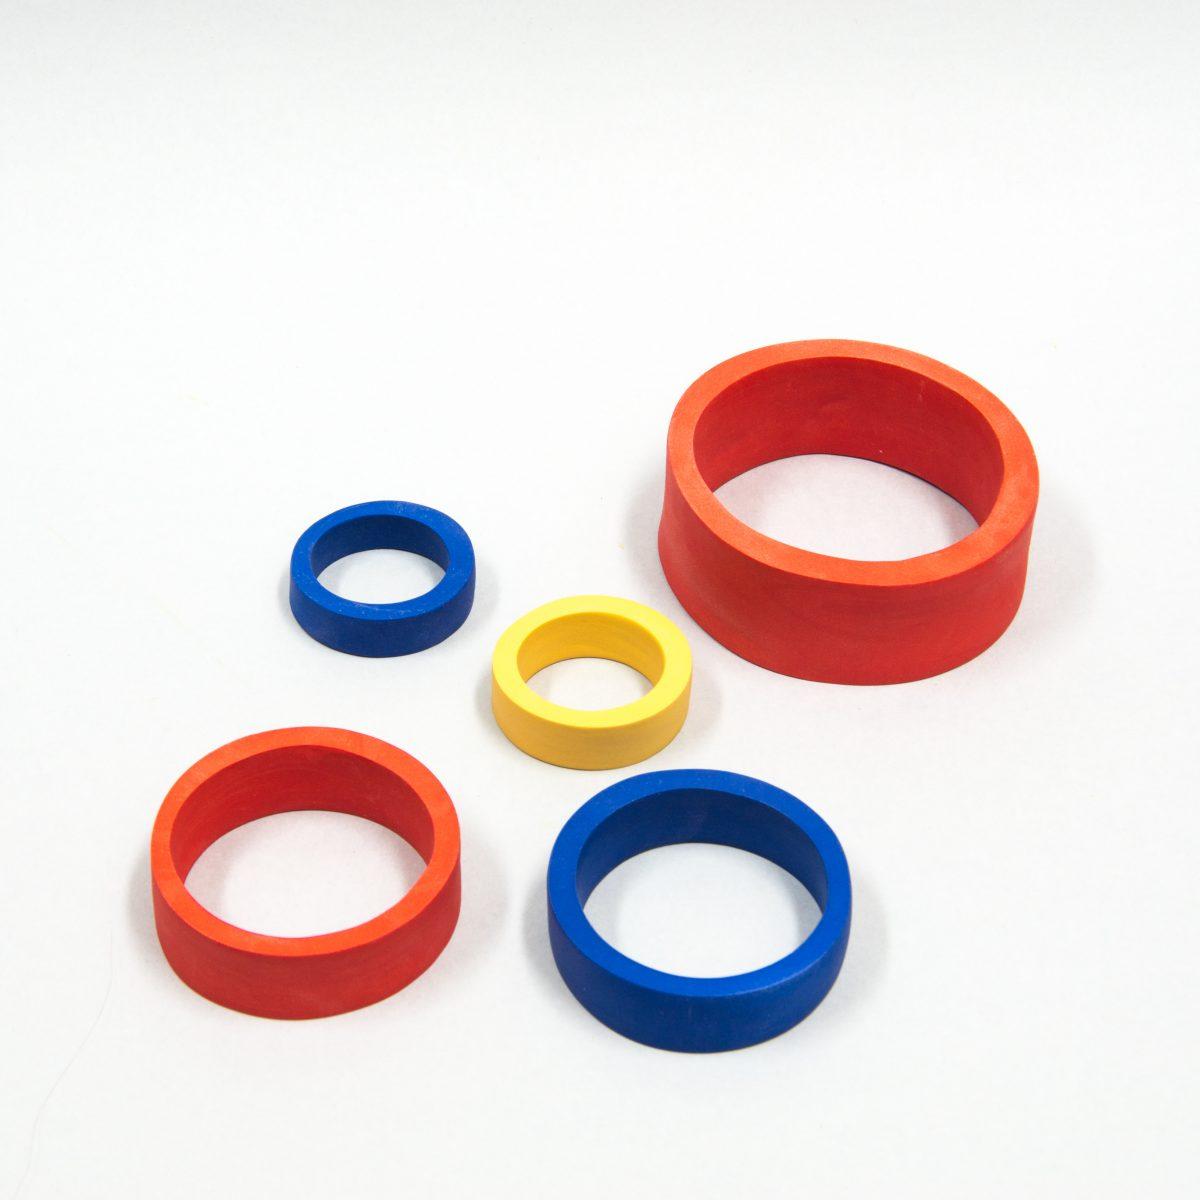 Vesna Garic - Composition Colored Circles